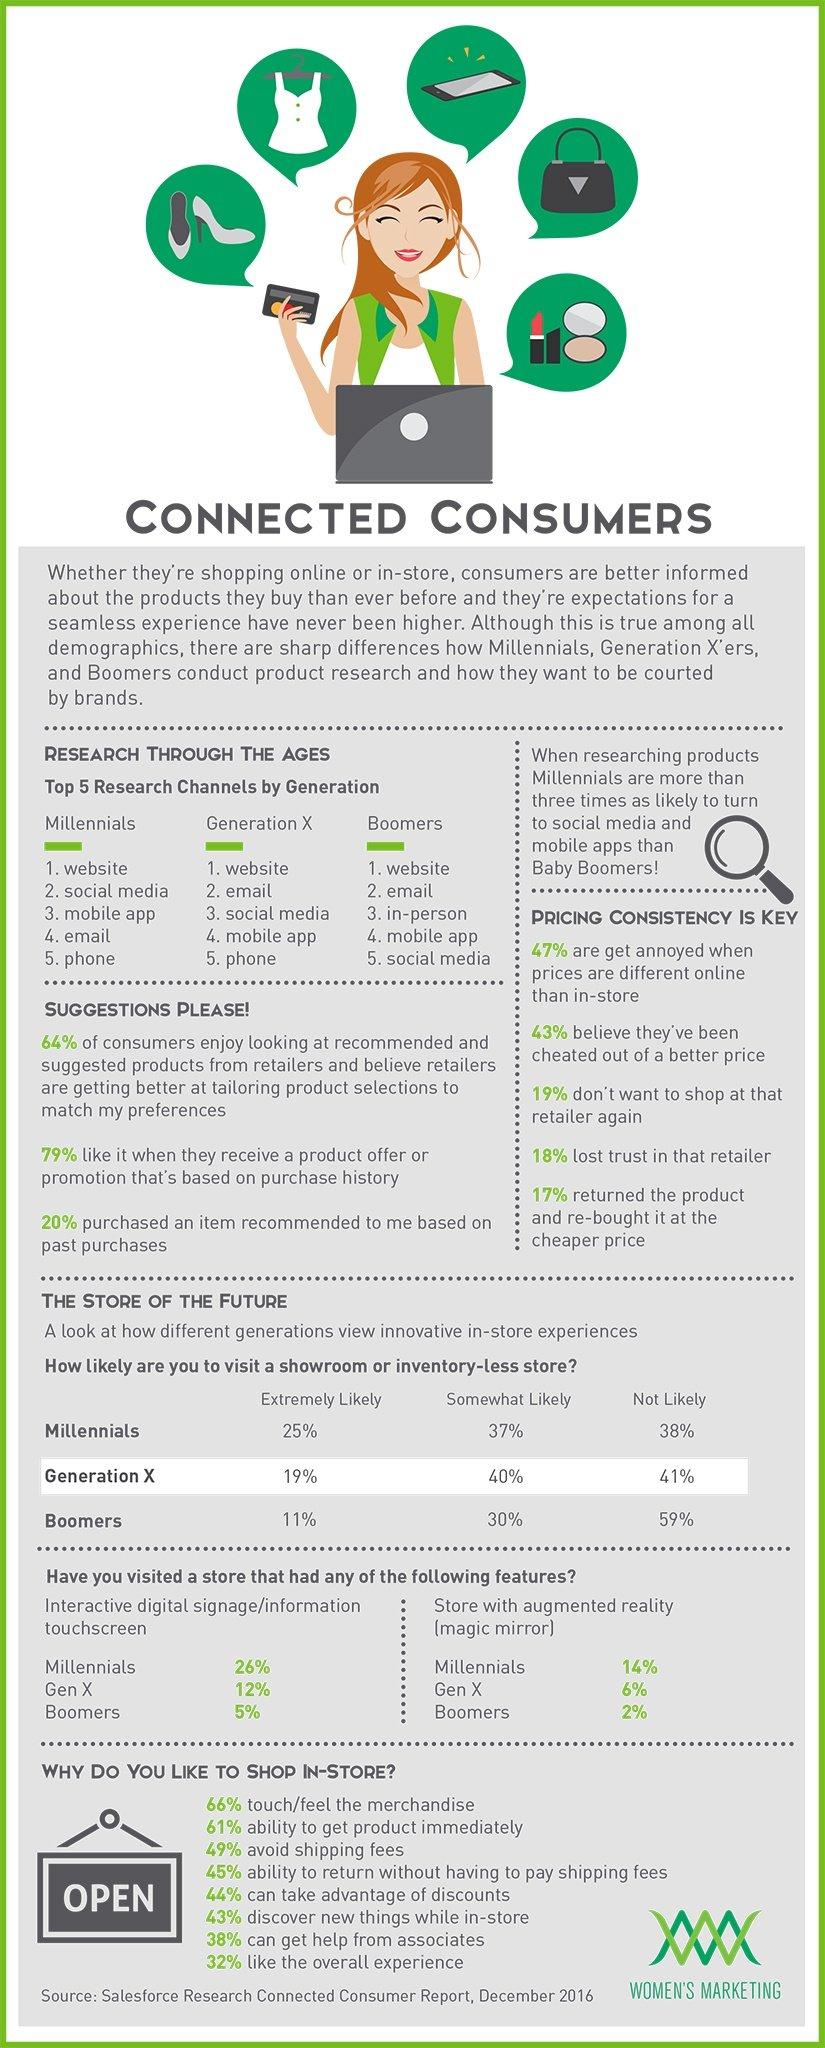 ConnectedConsumers_Infographic.jpg